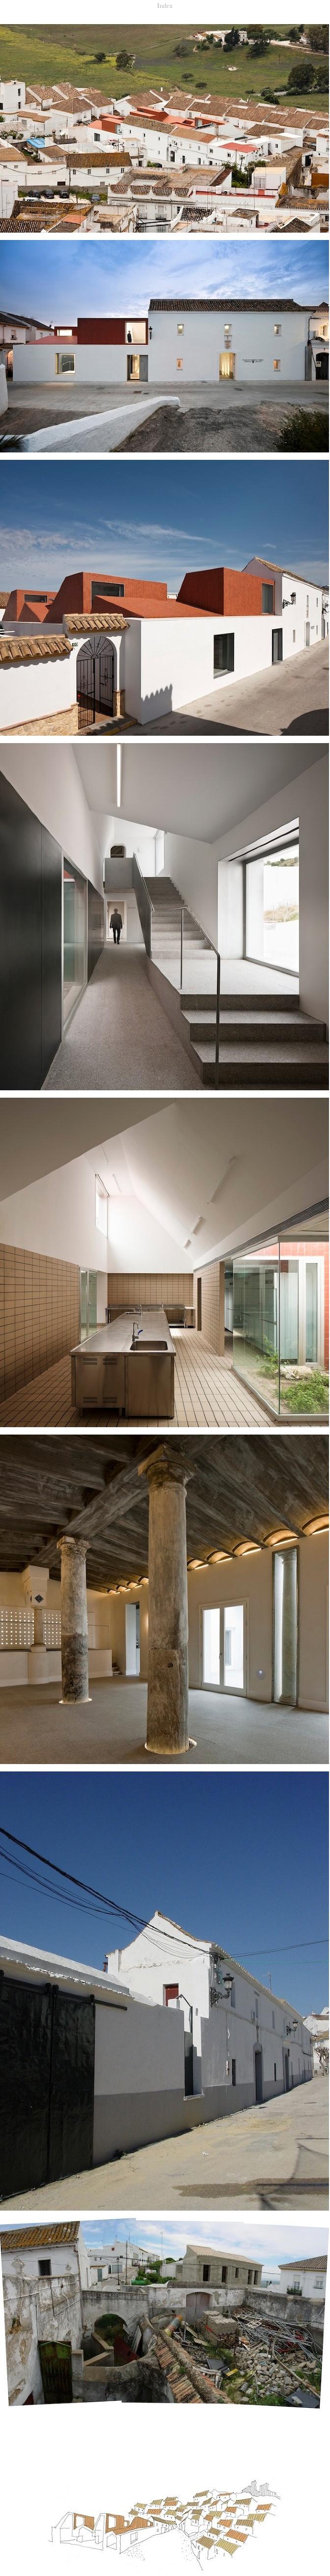 Professional cooking school in ancient slaughterhouse by - Arquitectos cadiz ...